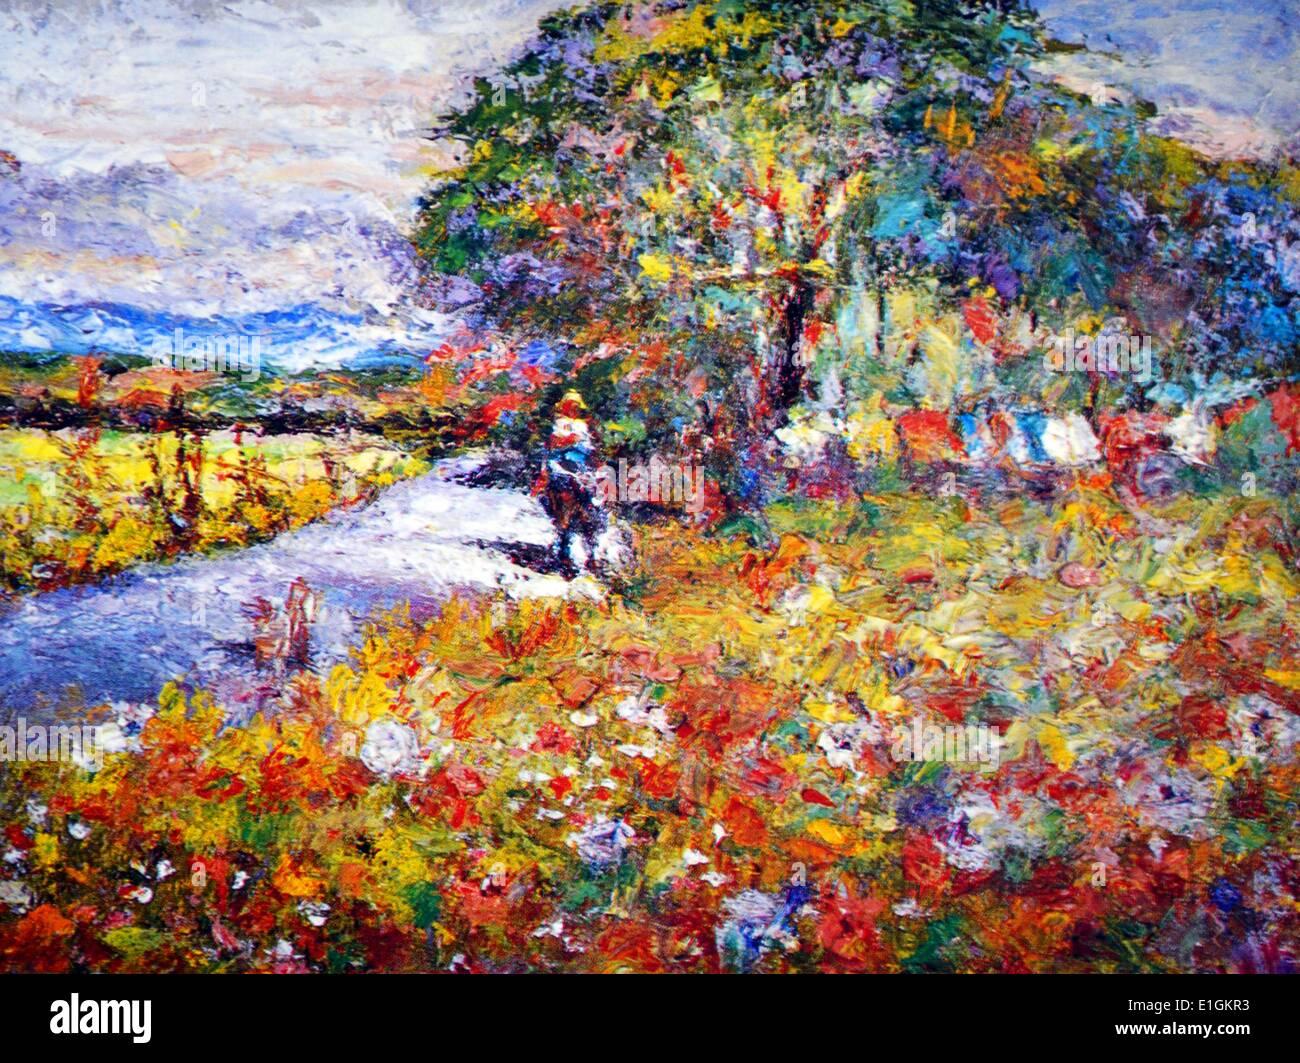 Virgilio Daclan, Homeward Bound, 1992.  Oil on canvas. - Stock Image